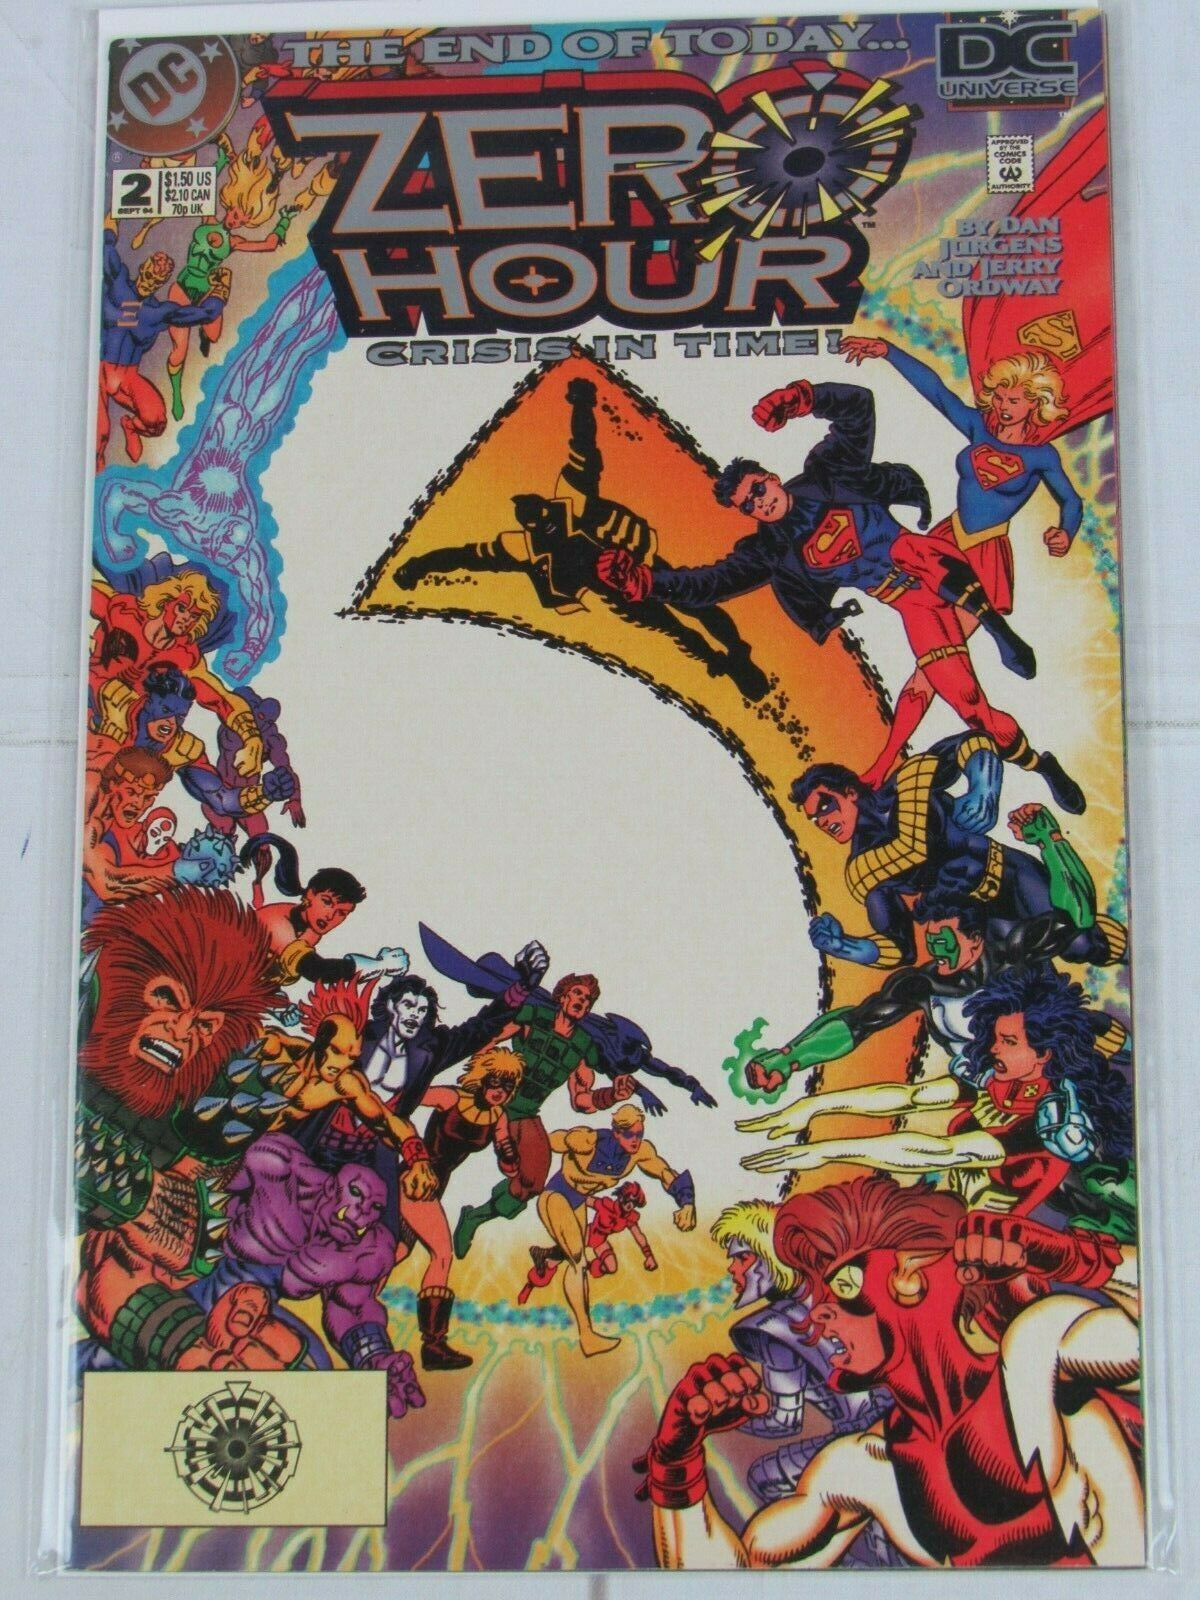 Zero Hour: Crisis in Time #0-4 Lot of 5 Comics DC Comics - C5005